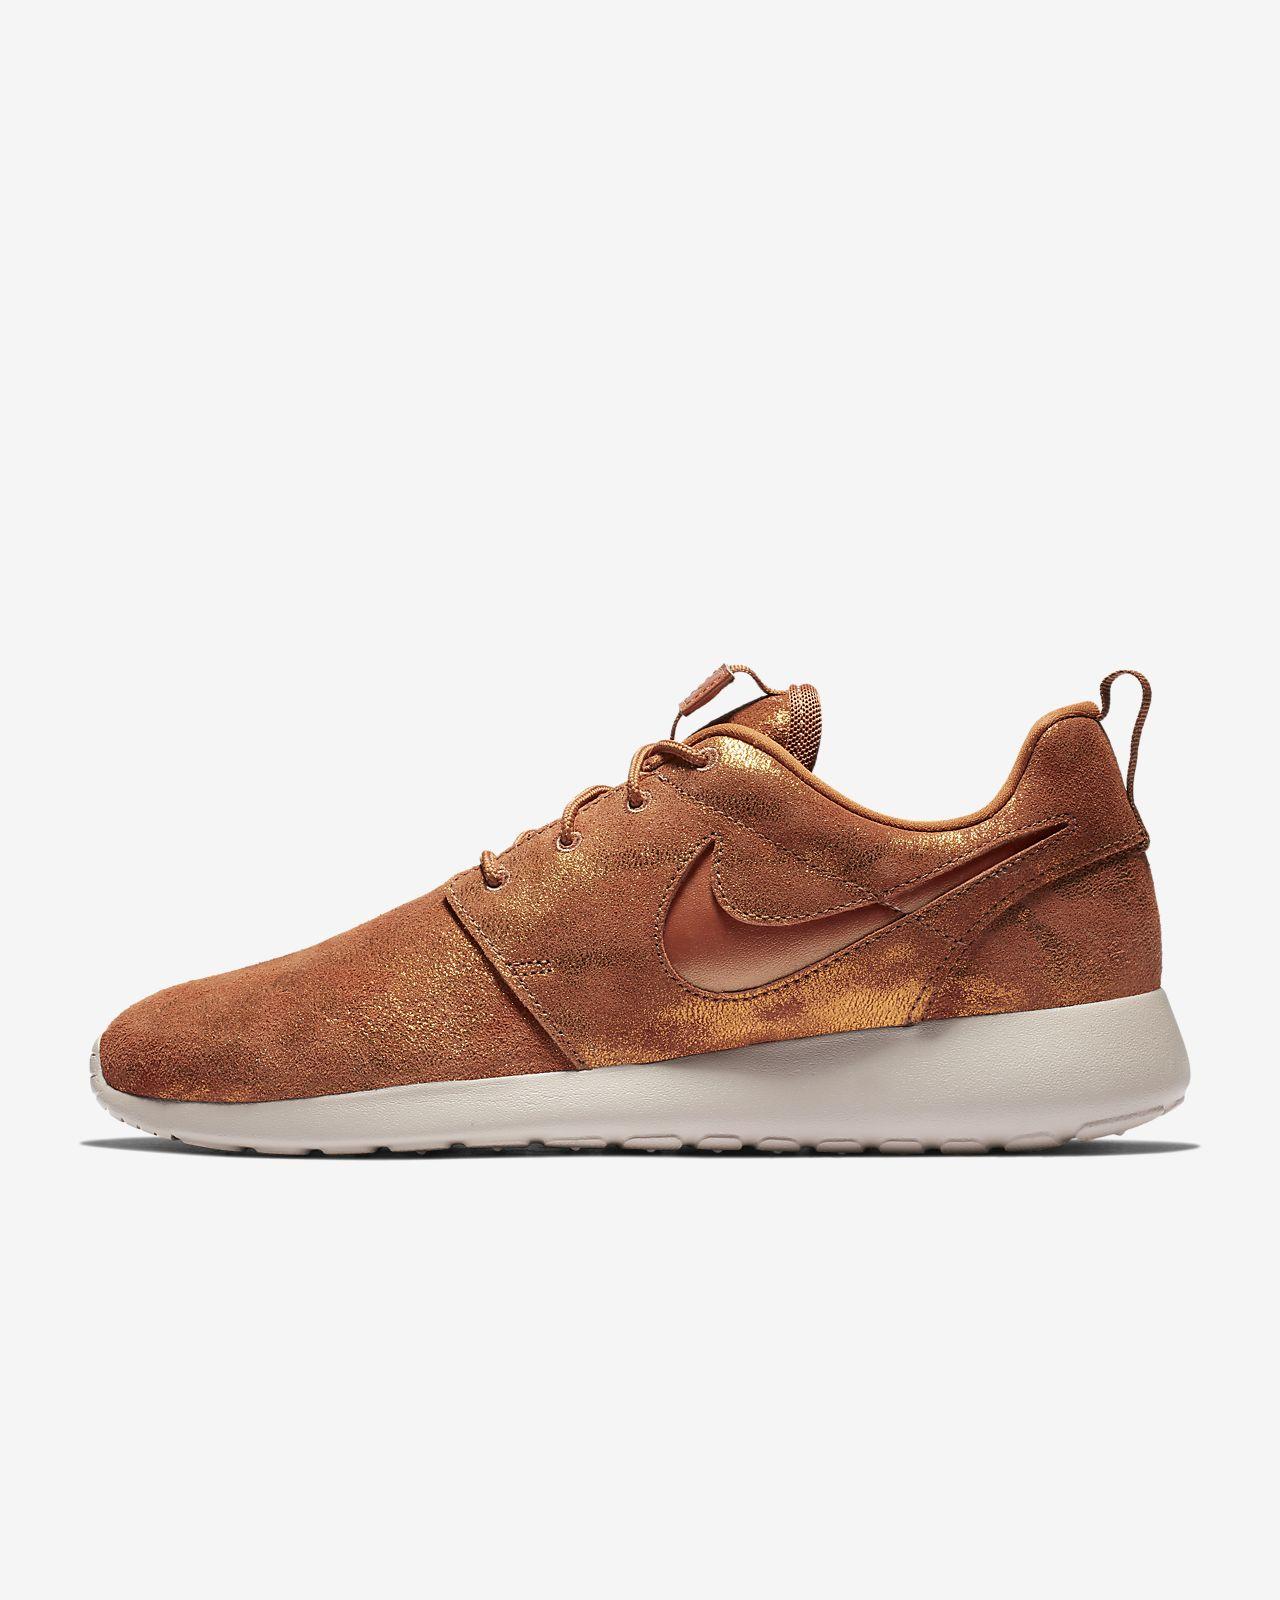 cfae1828b73 Nike Roshe One Premium Women s Shoe. Nike.com